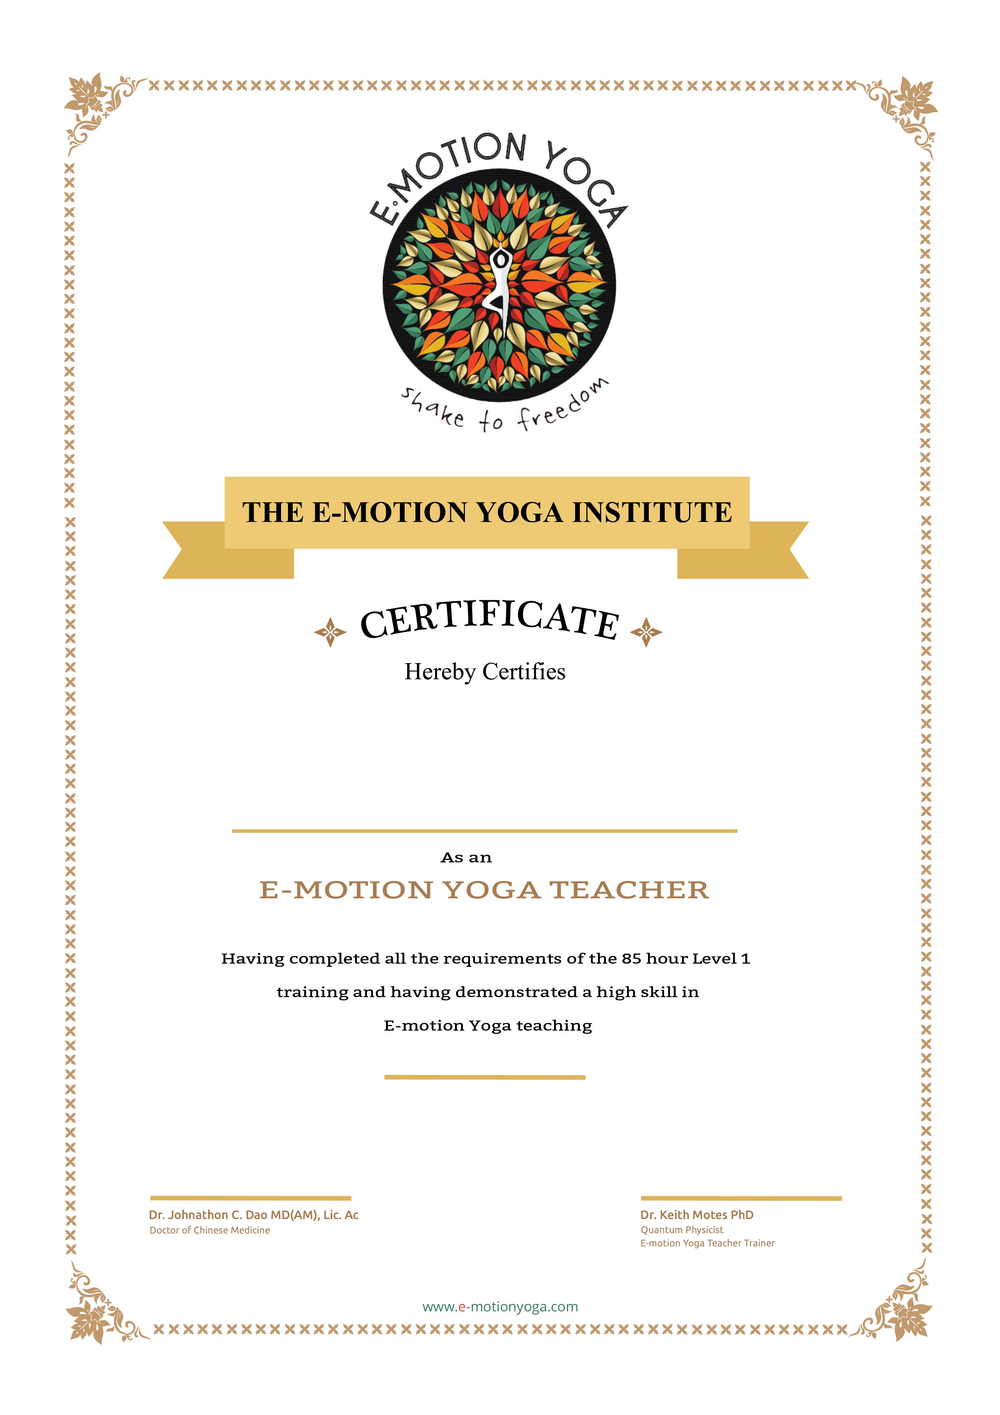 final-certificate03.png